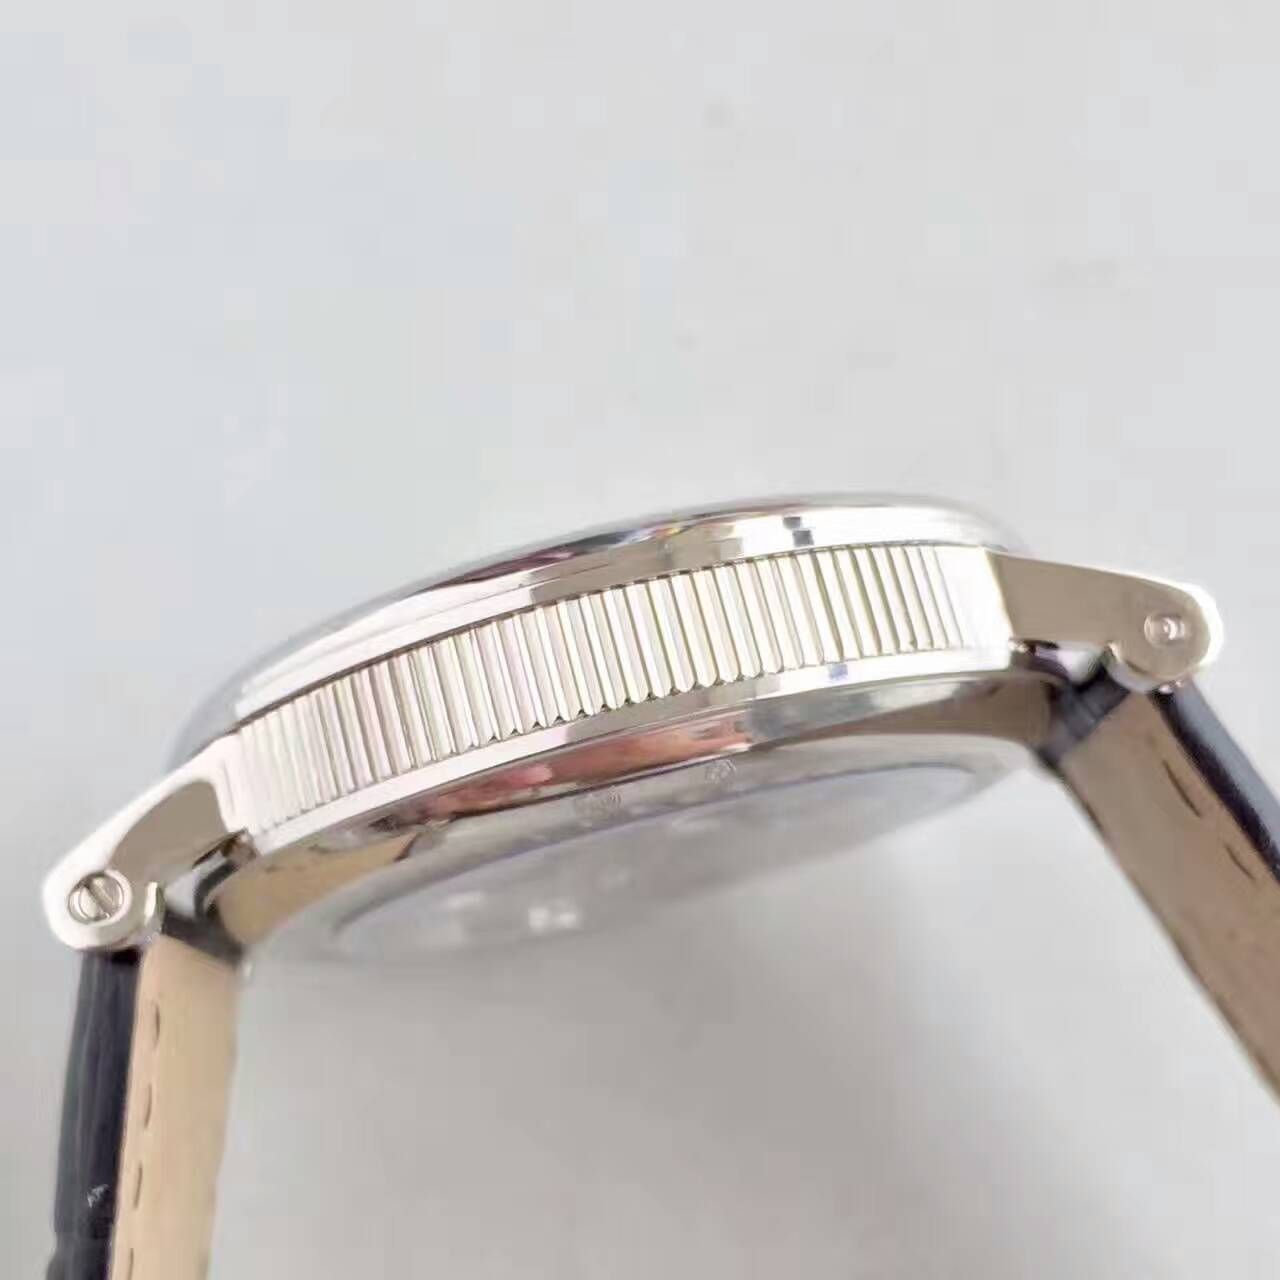 VF厂顶级复刻宝玑Classique复古系列月相腕表 / BZ027